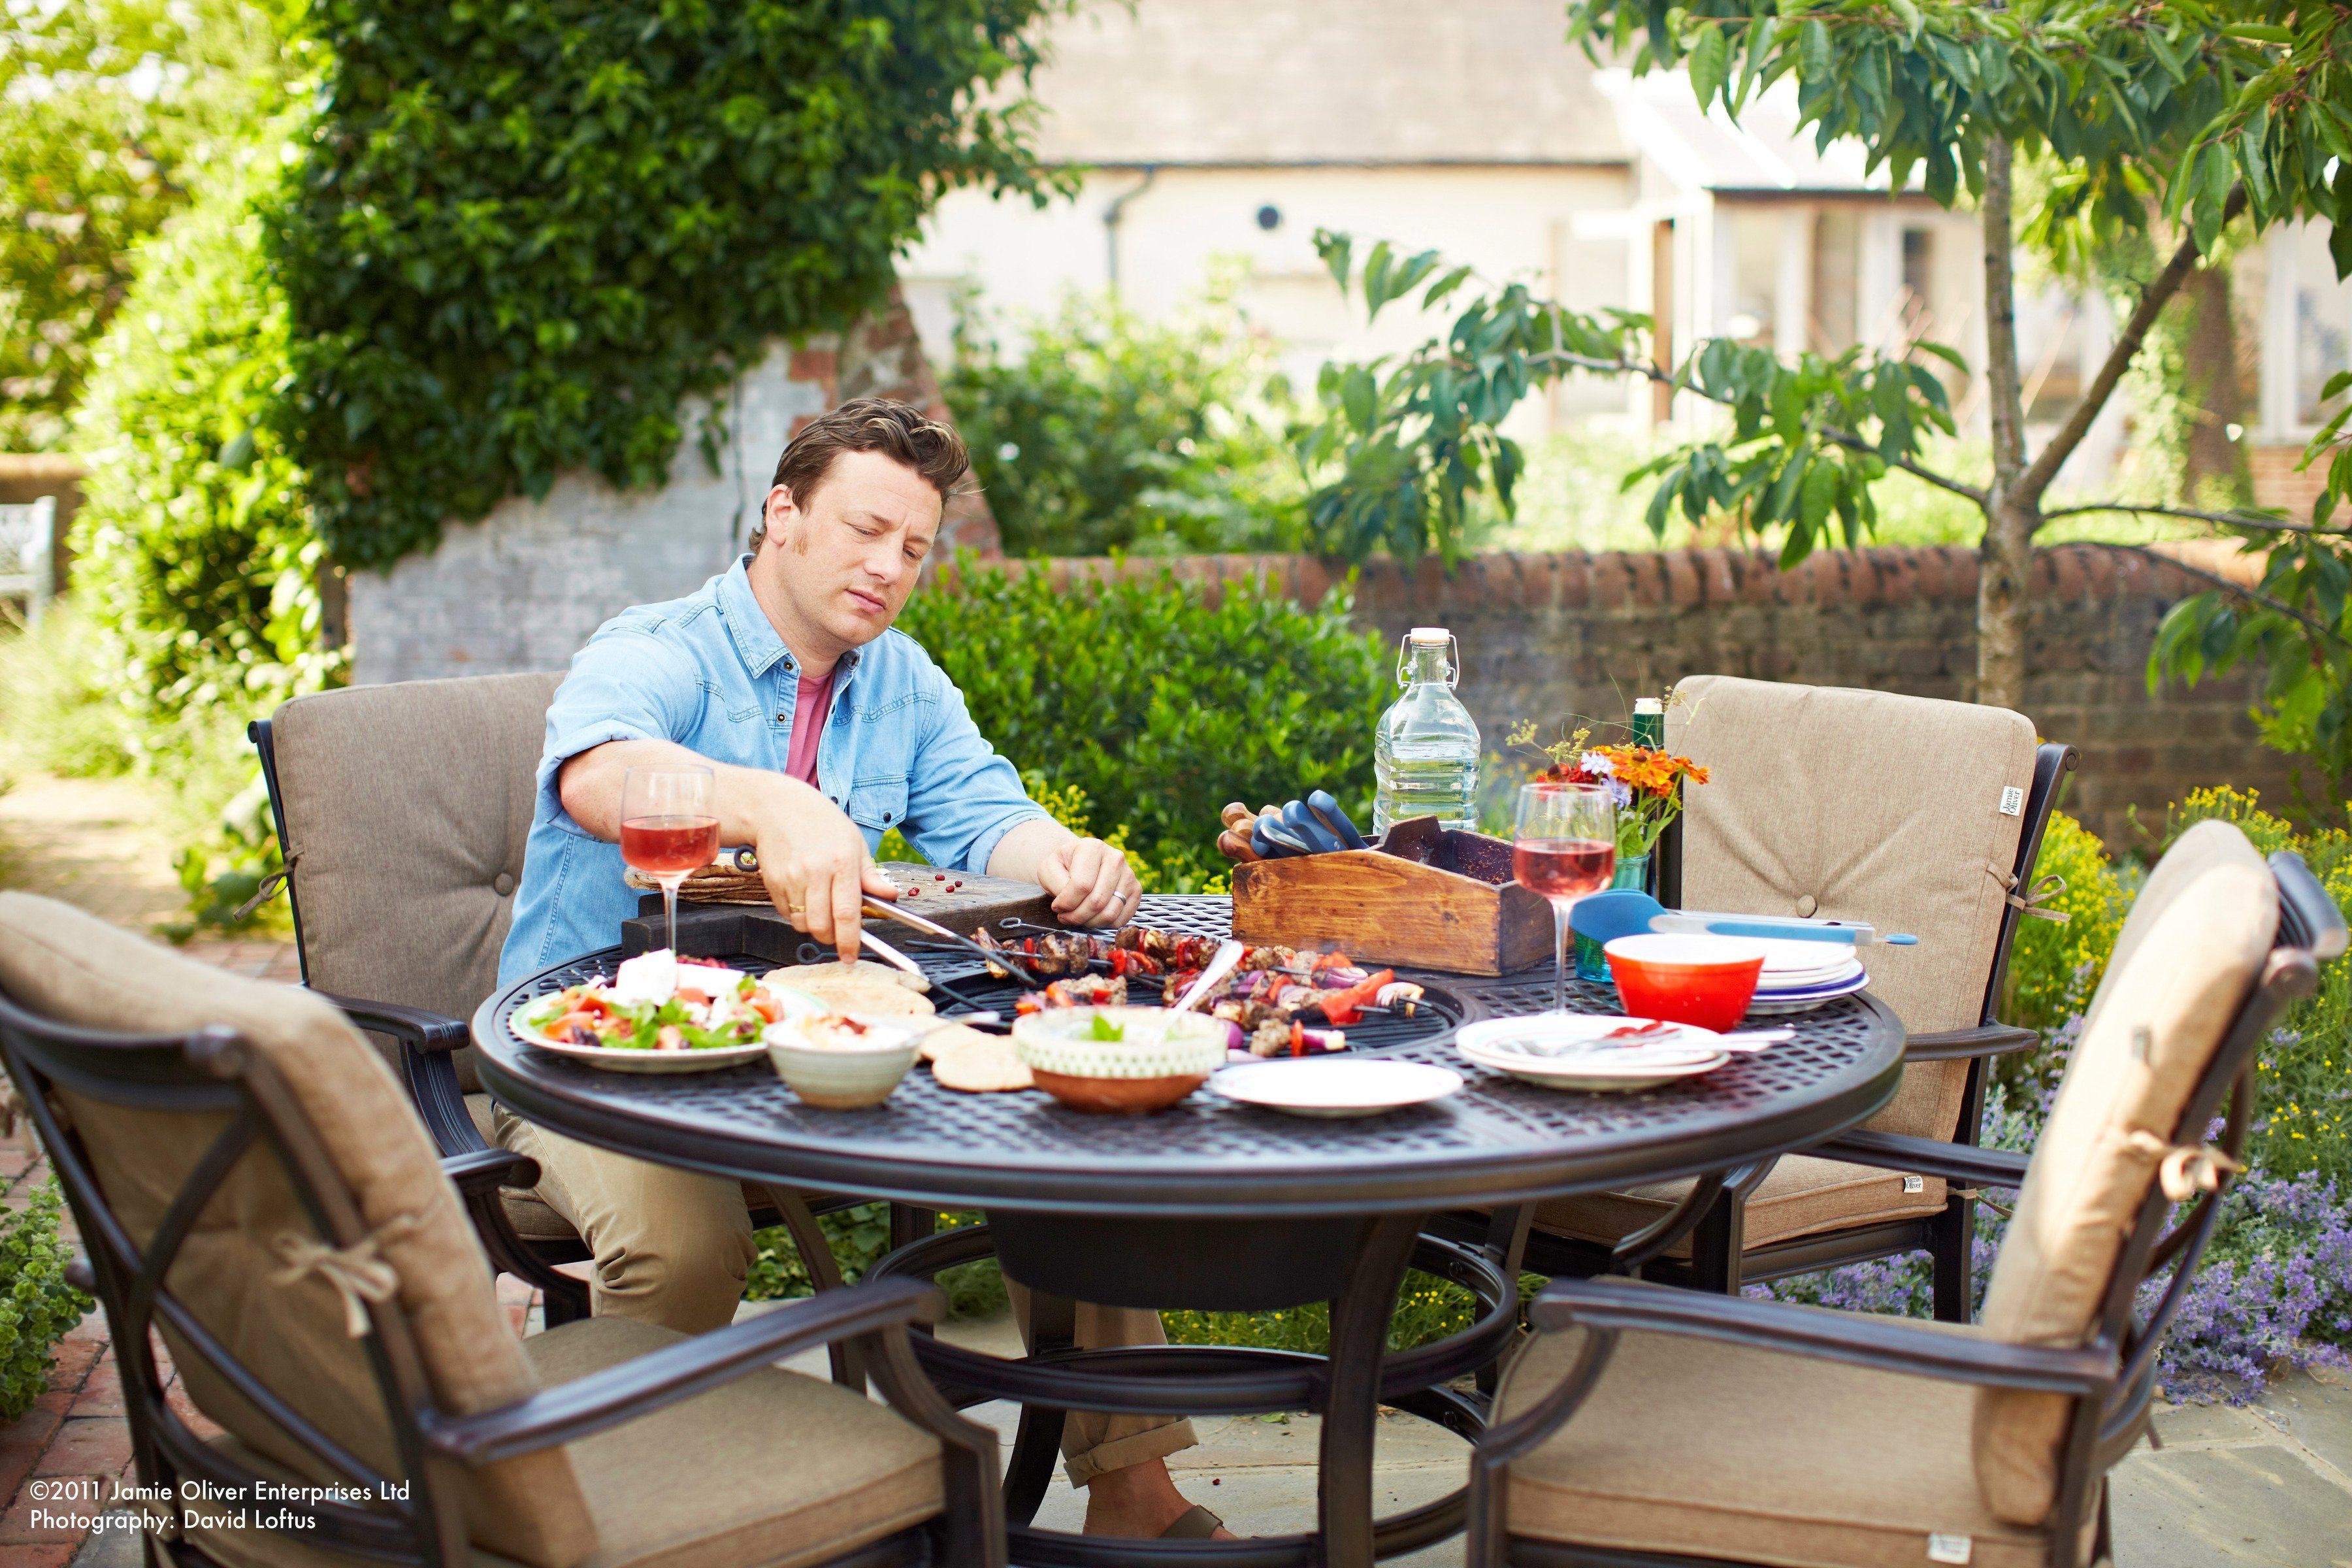 9-tlg. Gartenmöbelset »Jamie Oliver I«, 4 Sessel, Tisch Ø 130 cm, Aluminium, anthrazit